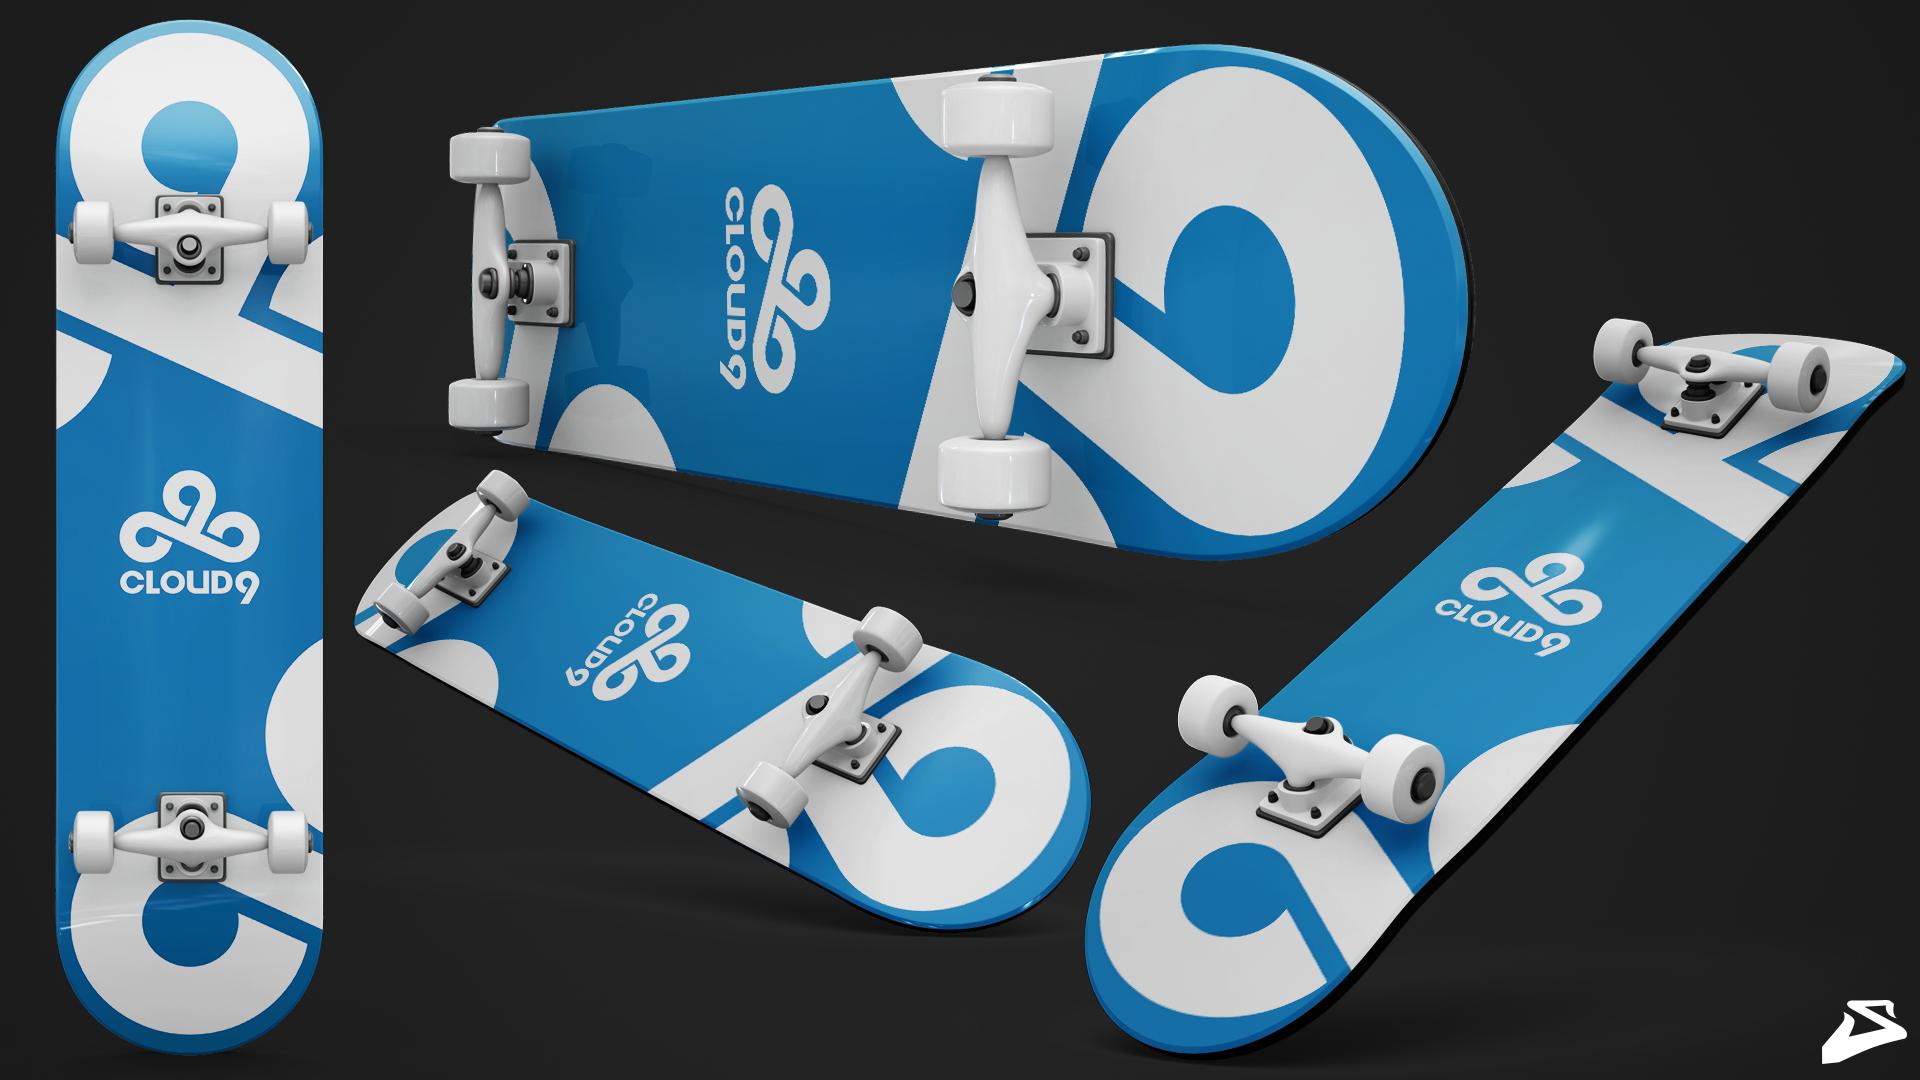 Cloud 9 Skate